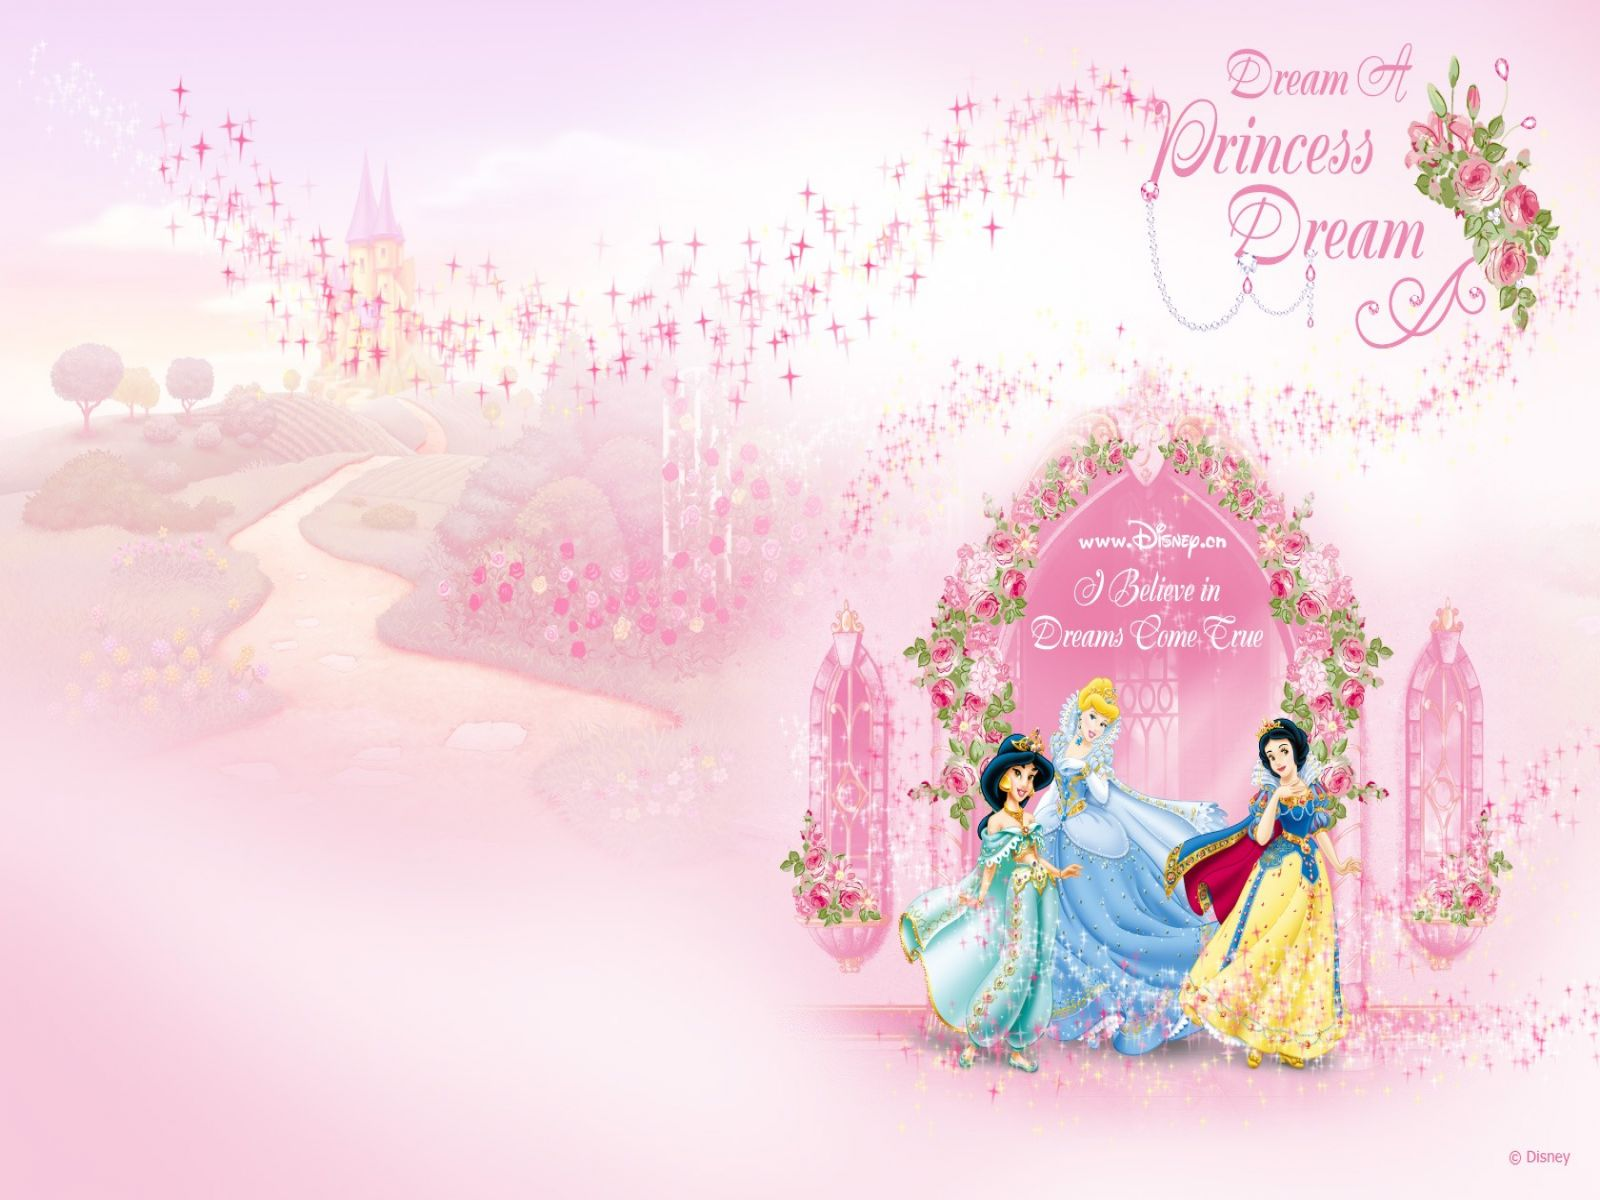 1600x1200 Wallpapers Wallpaper Disney Movie Songs Cinderella Disney 1600x1200